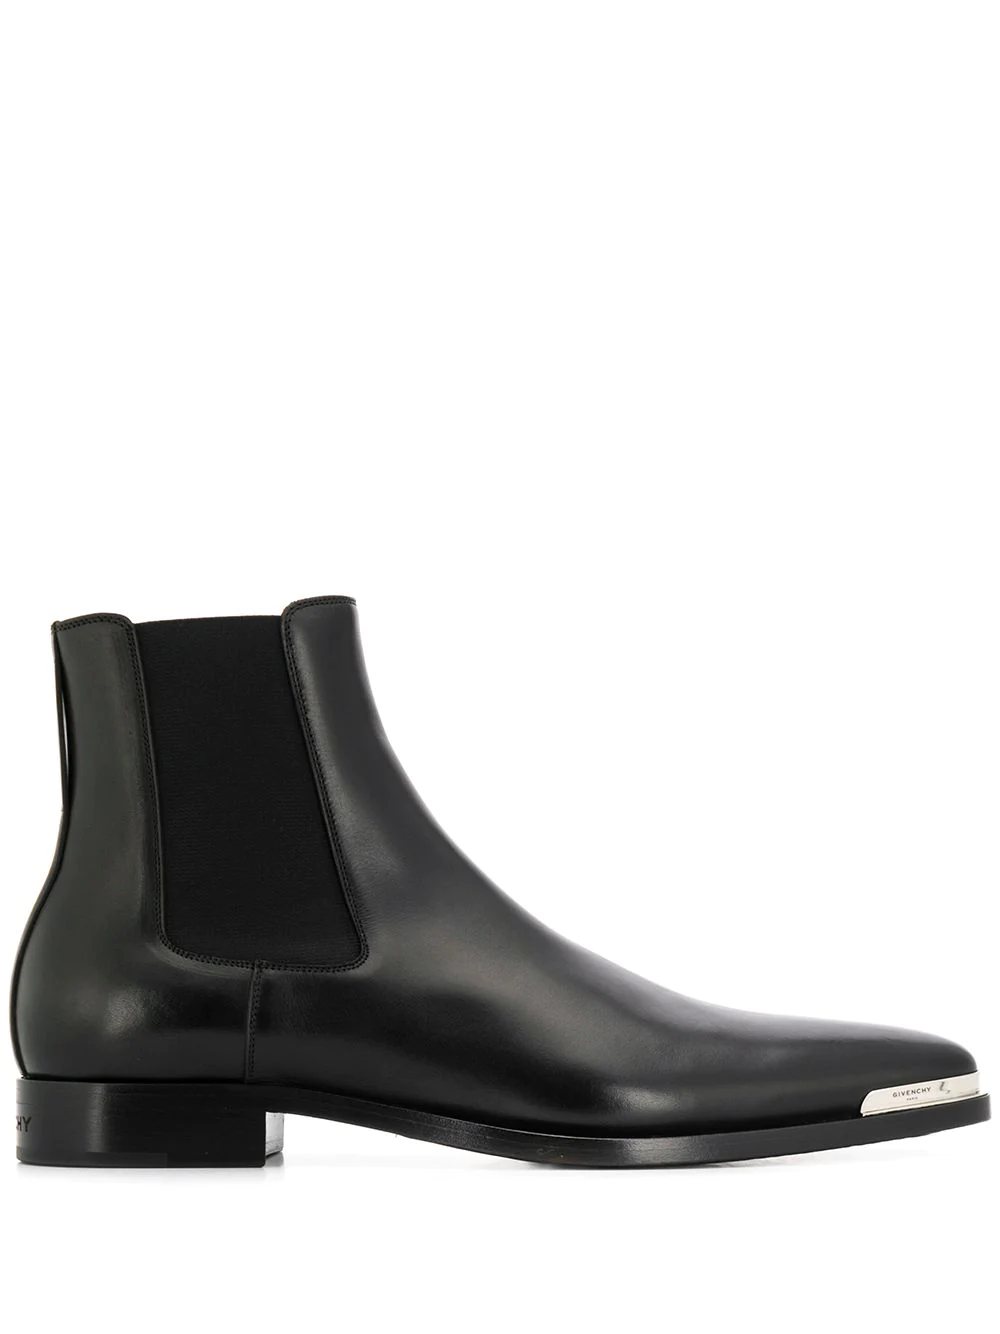 GIVENCHY | ботинки челси | Clouty